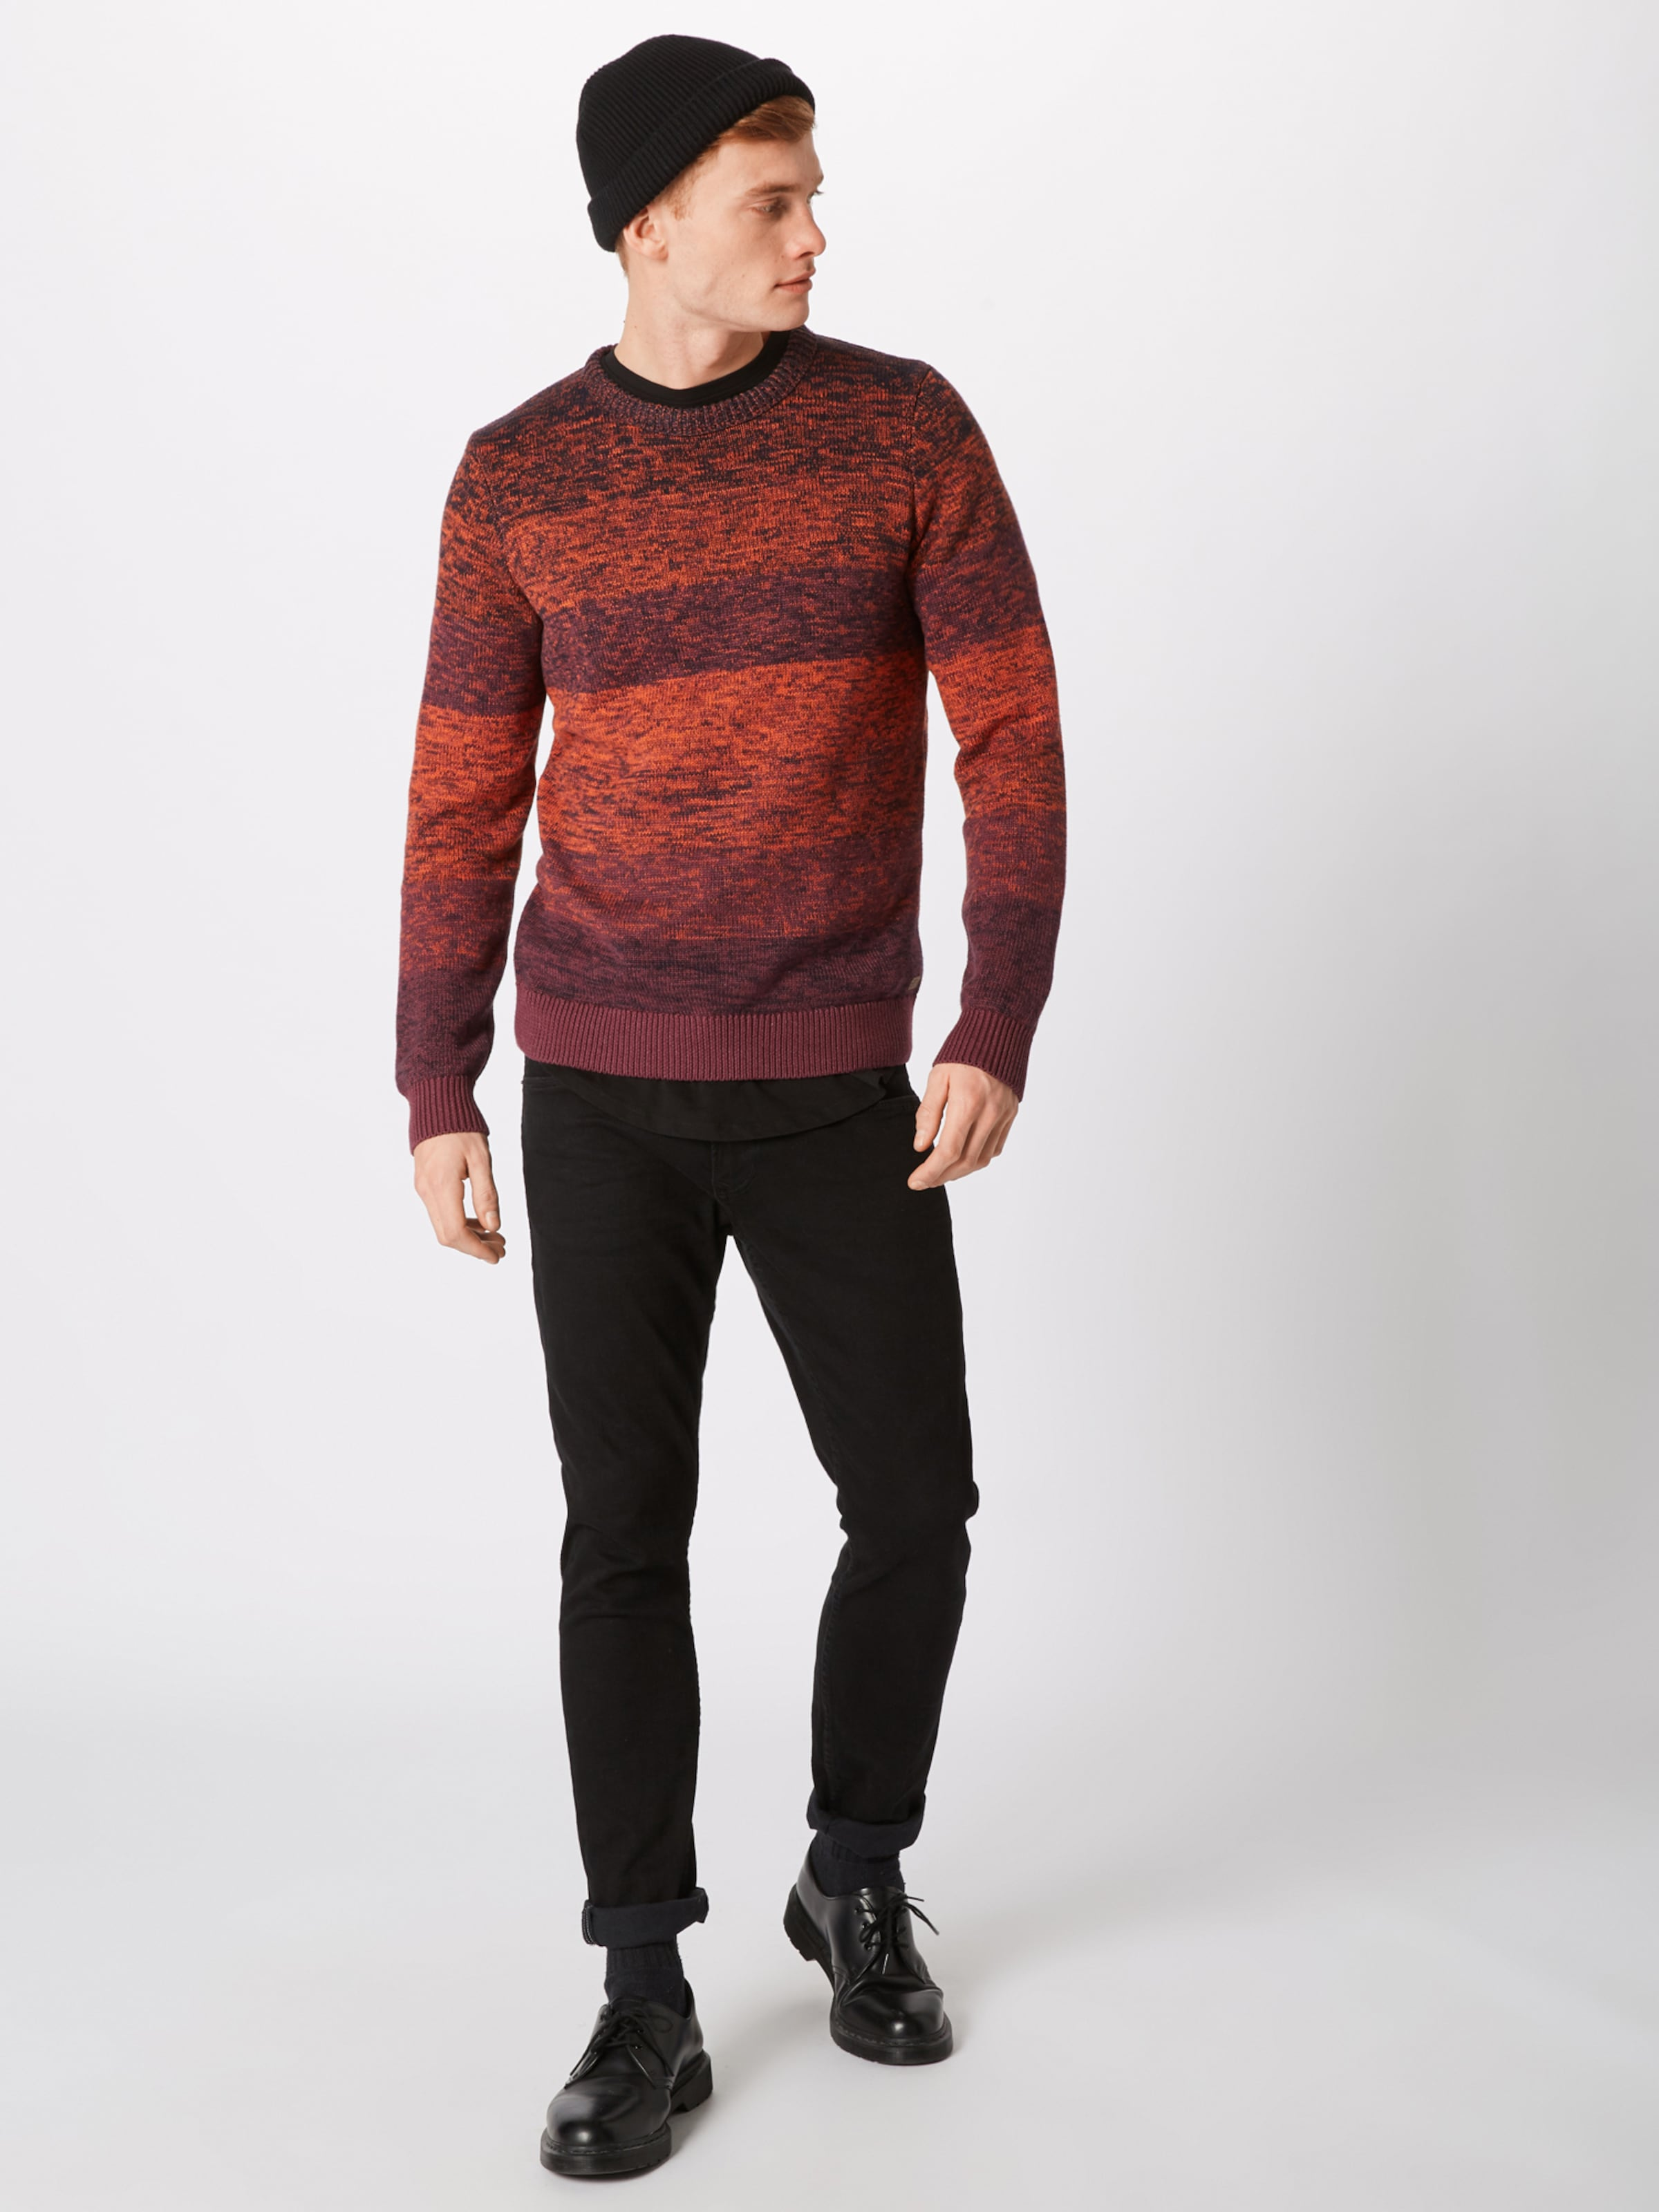 In Pullover Tailor OrangeKarminrot Tom 0nyvNOmw8